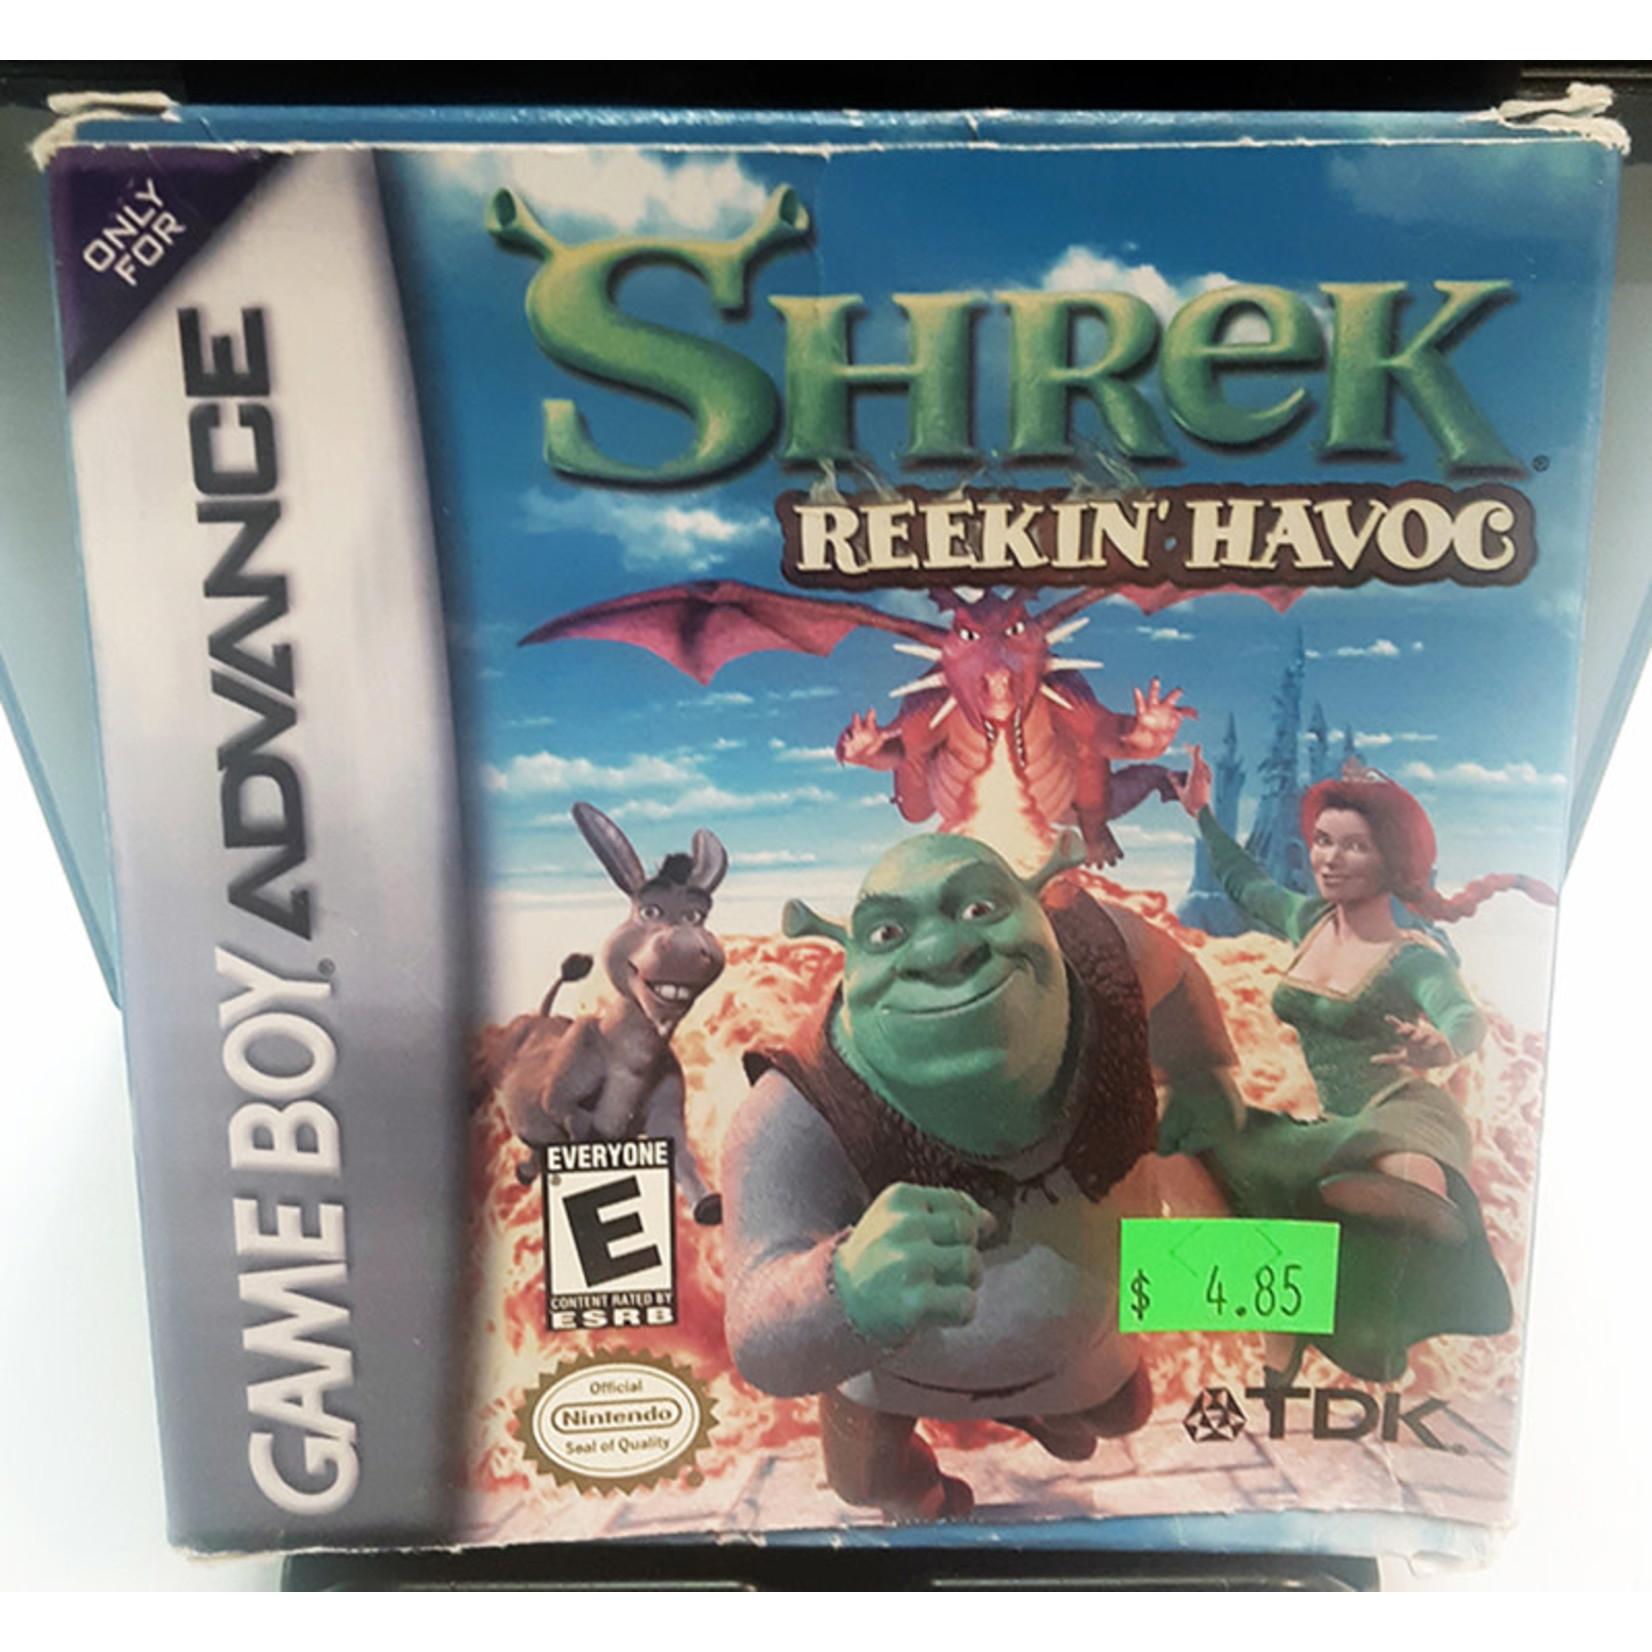 gbau-shrek Reekin' Havoc (in box)